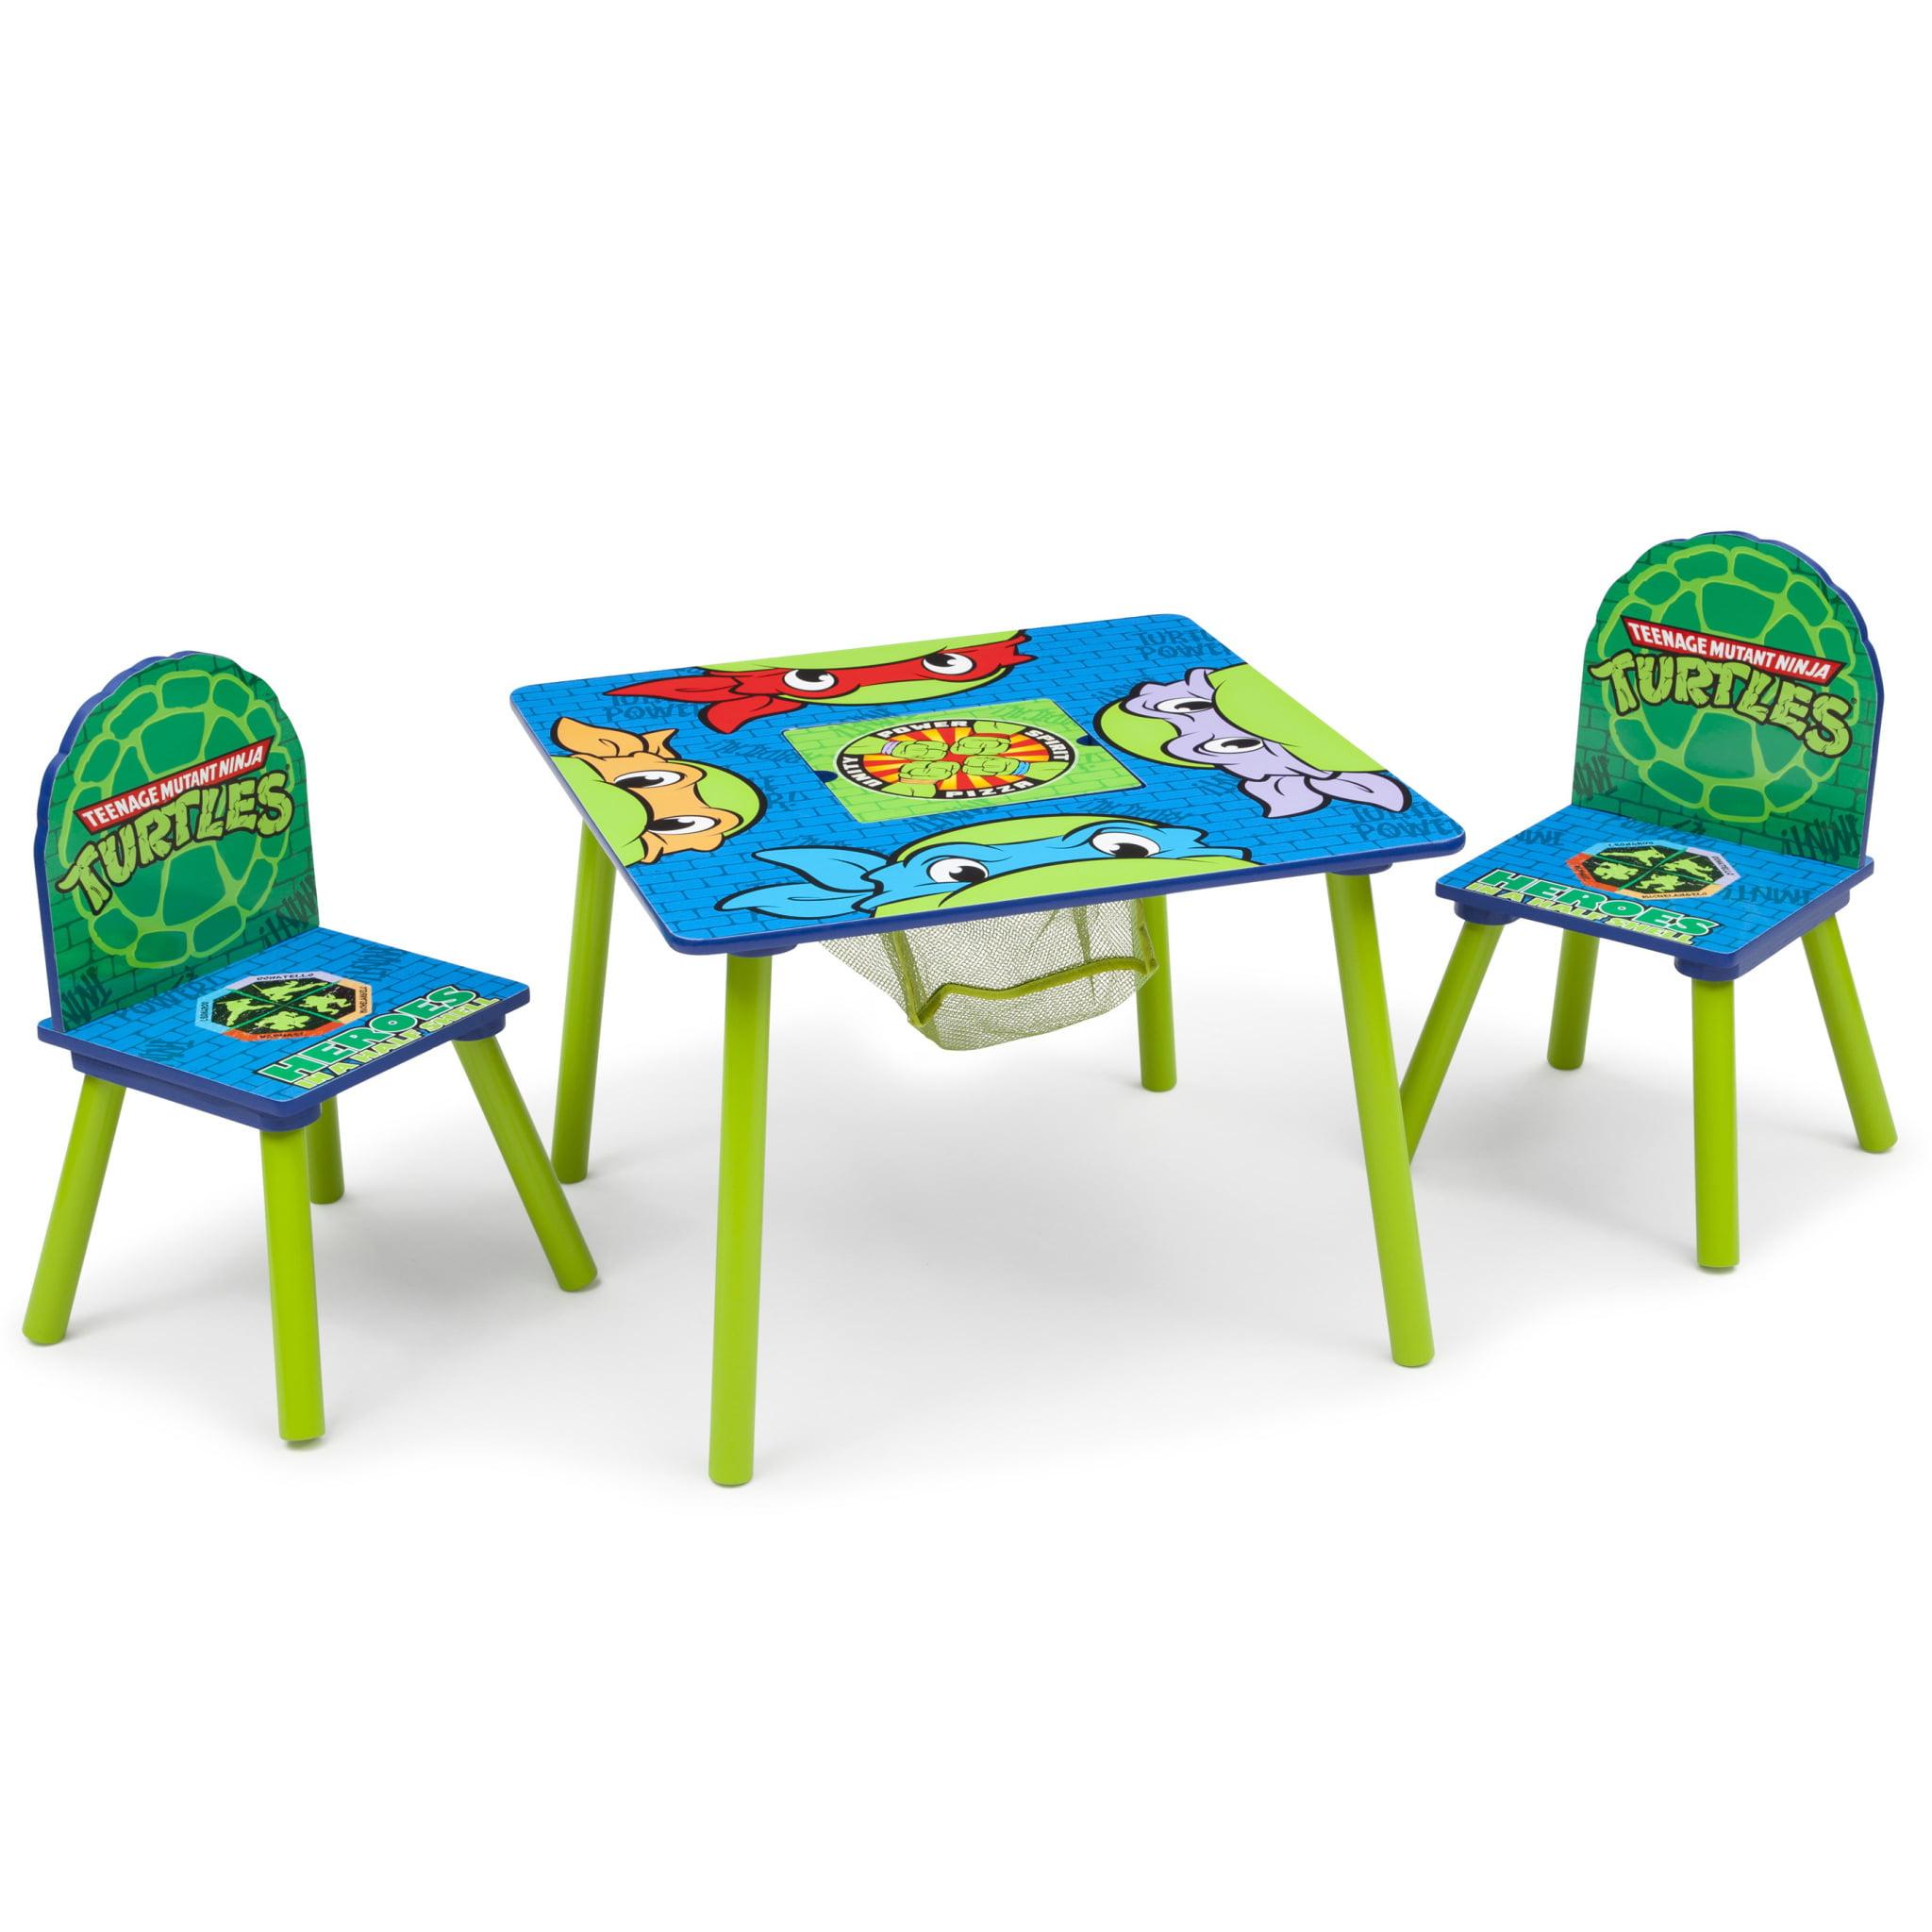 Nickelodeon Teenage Mutant Ninja Turtles Wood Kids Storage Table and Chairs Set by Delta... by Nickelodeon